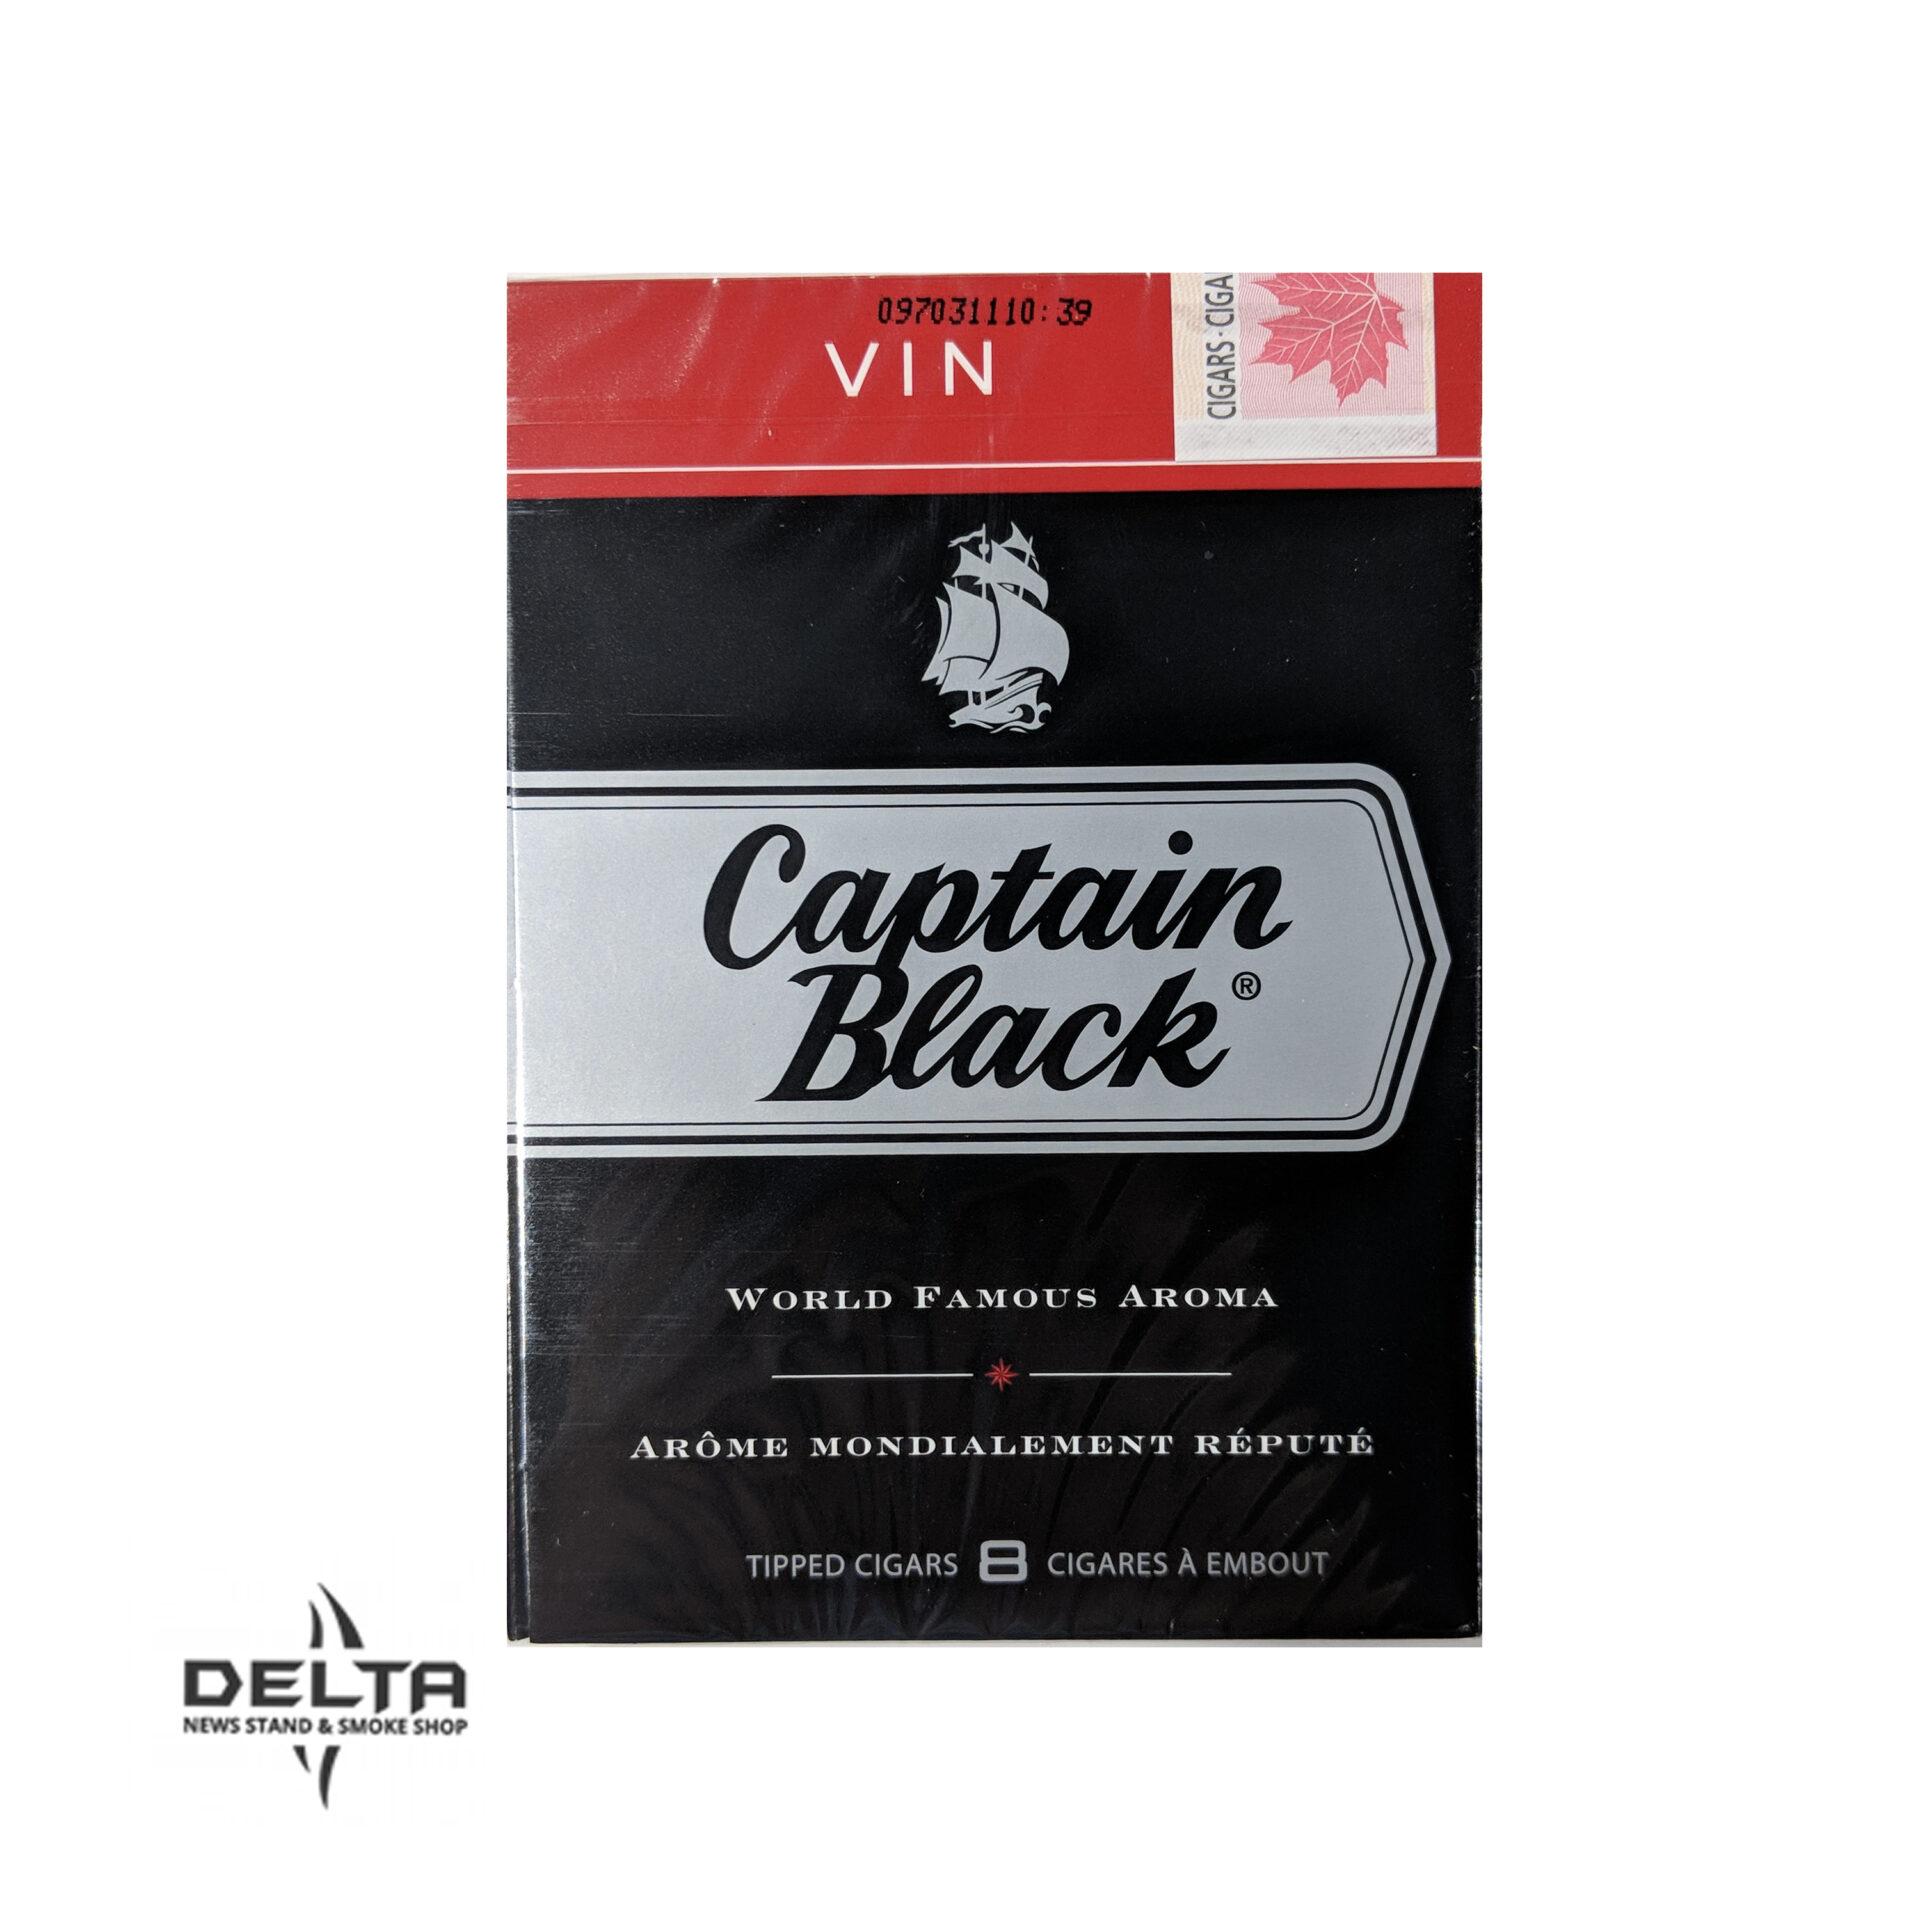 Captain black cigars buy an electronic cigarette kit